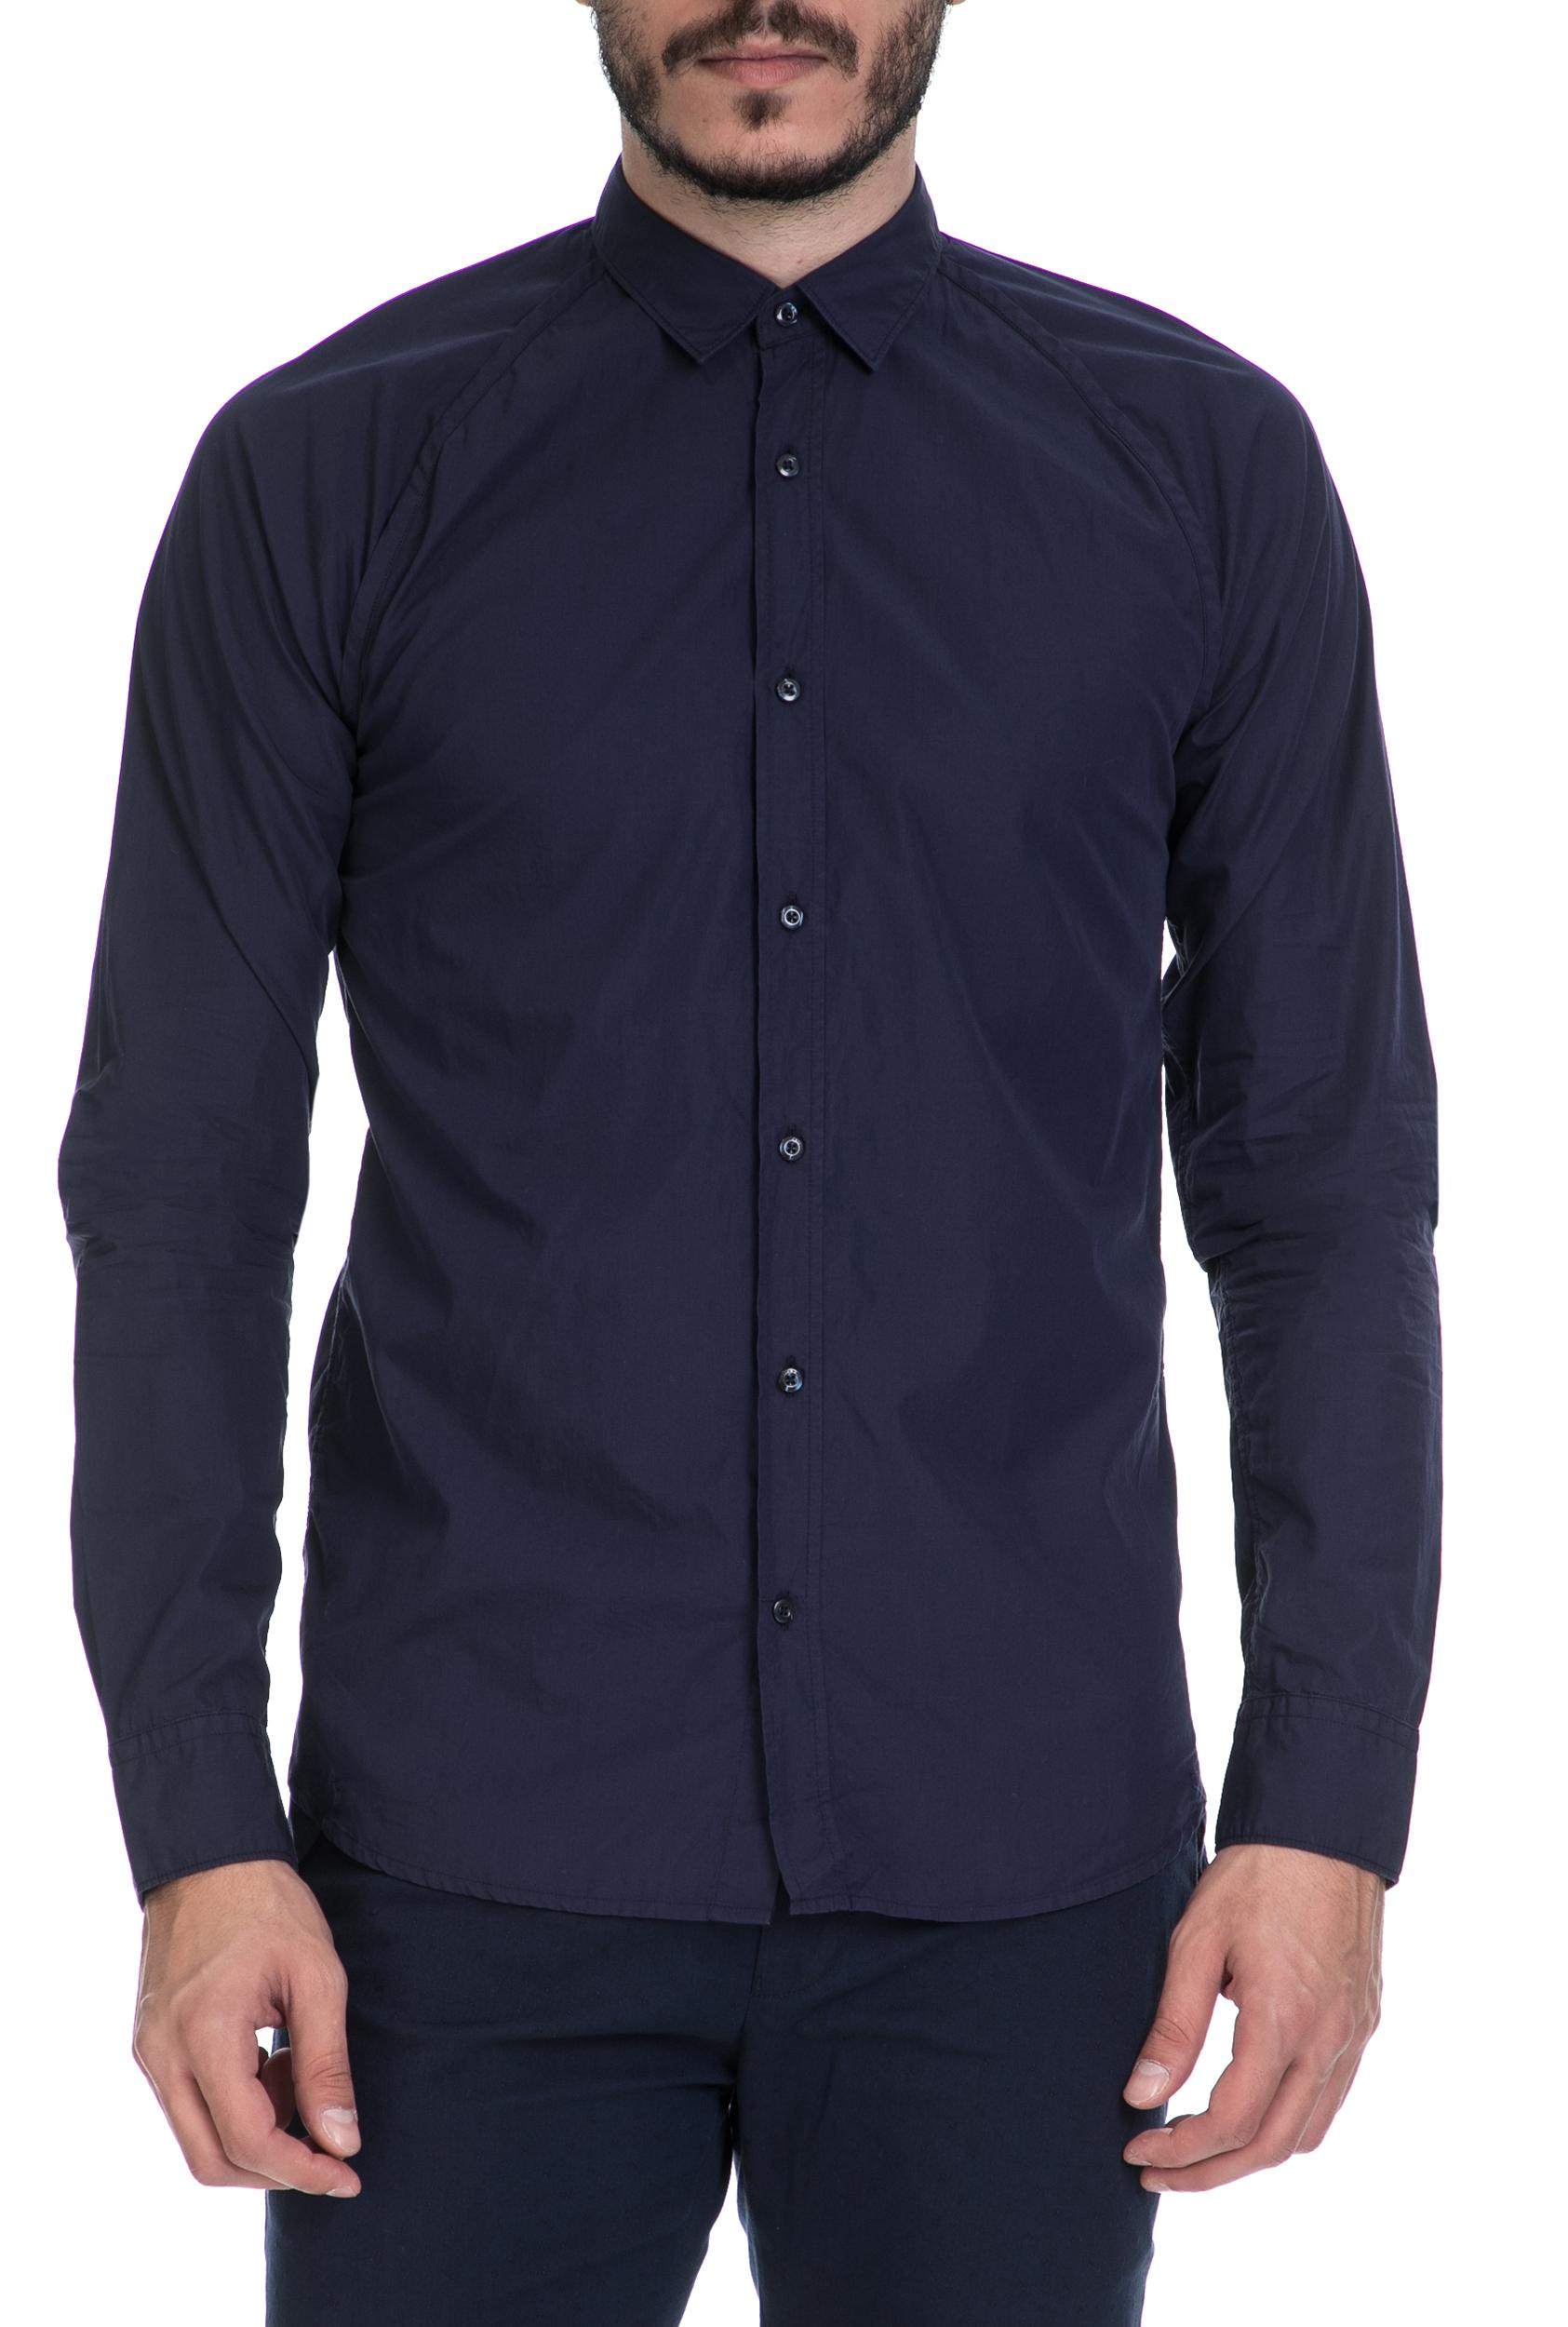 ecf4bff33846 SCOTCH   SODA – Ανδρικό πουκάμισο SCOTCH   SODA μπλε 1566519.0-001B 51